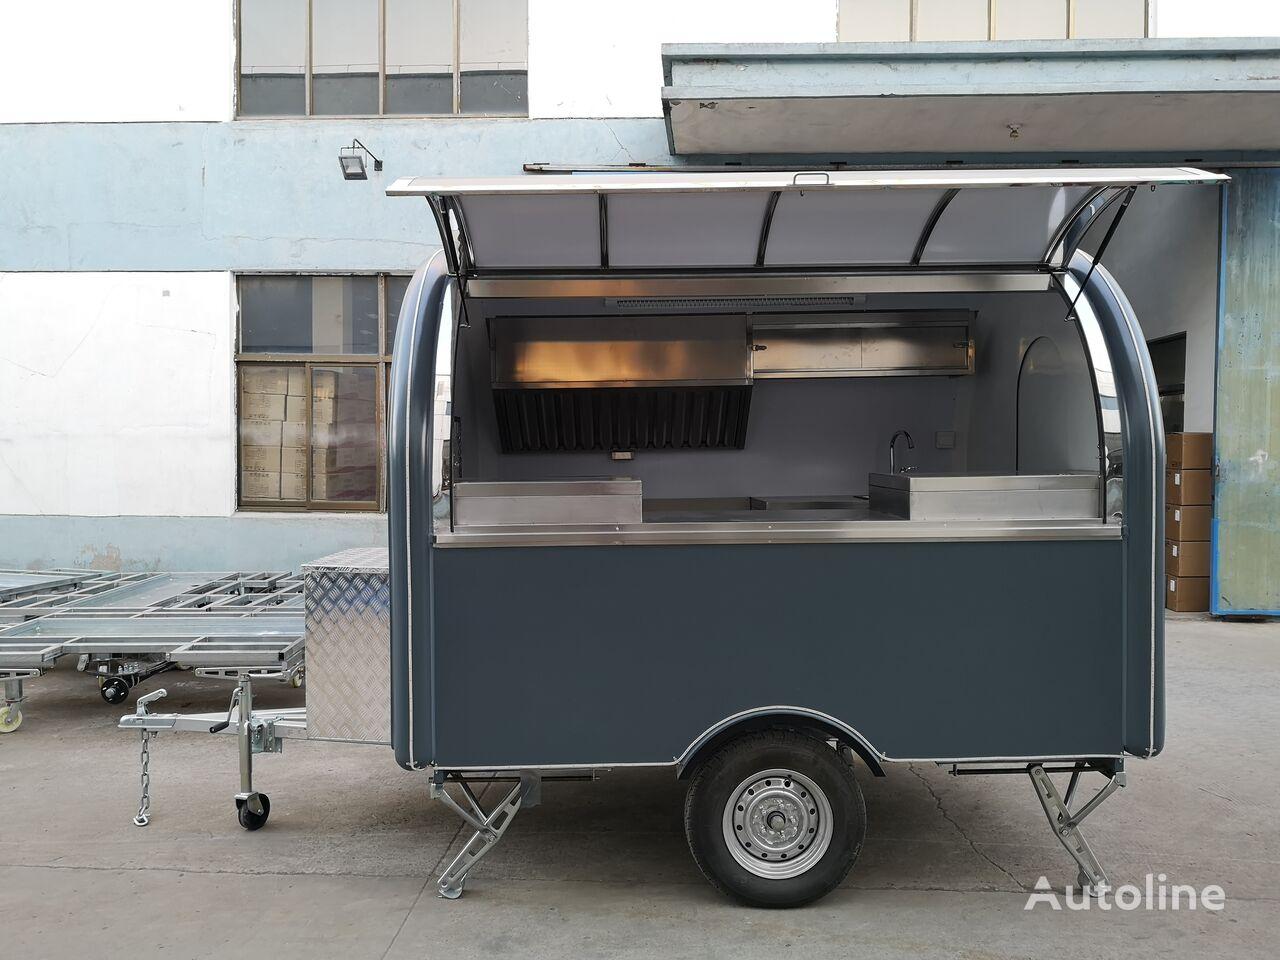 ERZODA ETB/Catering trailer/food trailer/catering van vending trailer